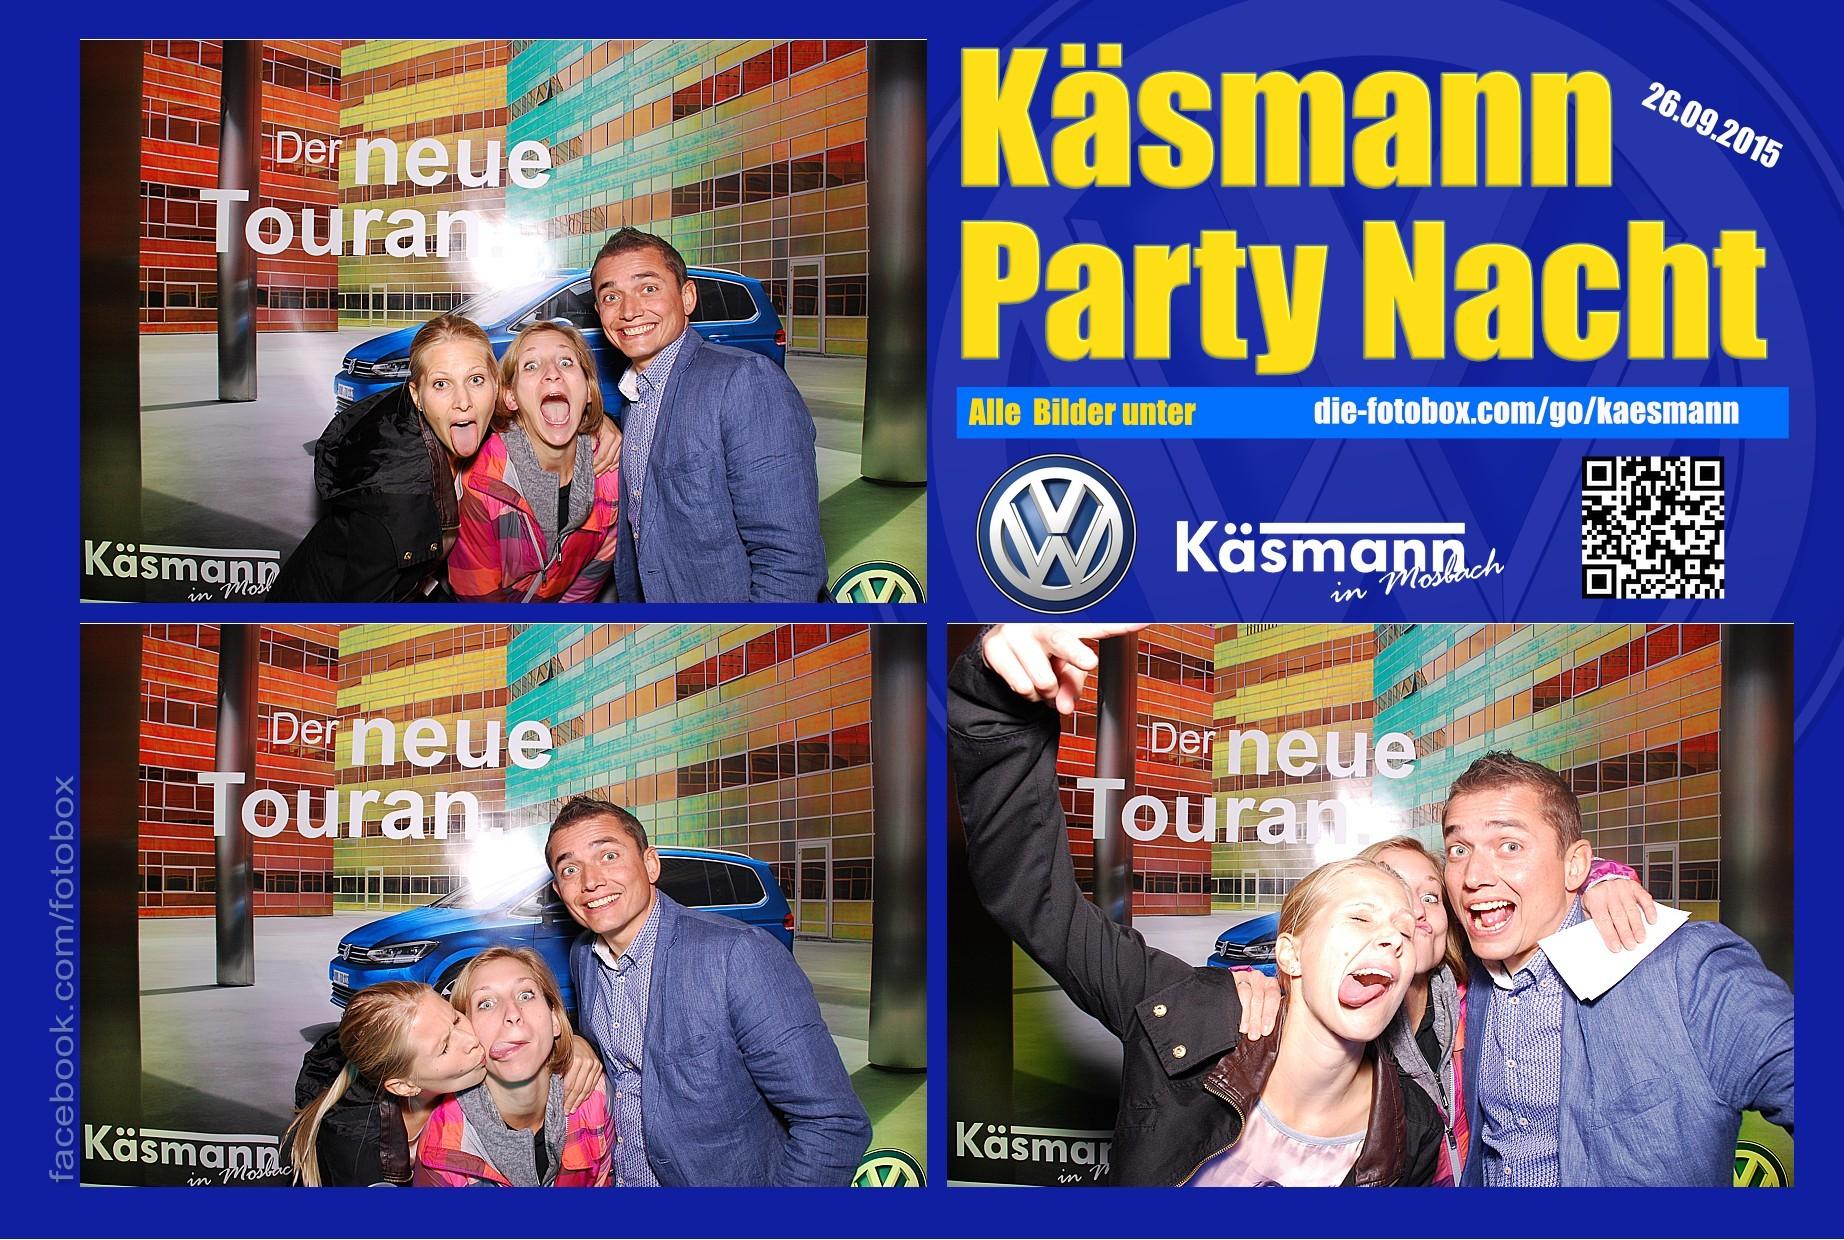 Käsmannparty 2015 - www.die-fotobox.com 01274